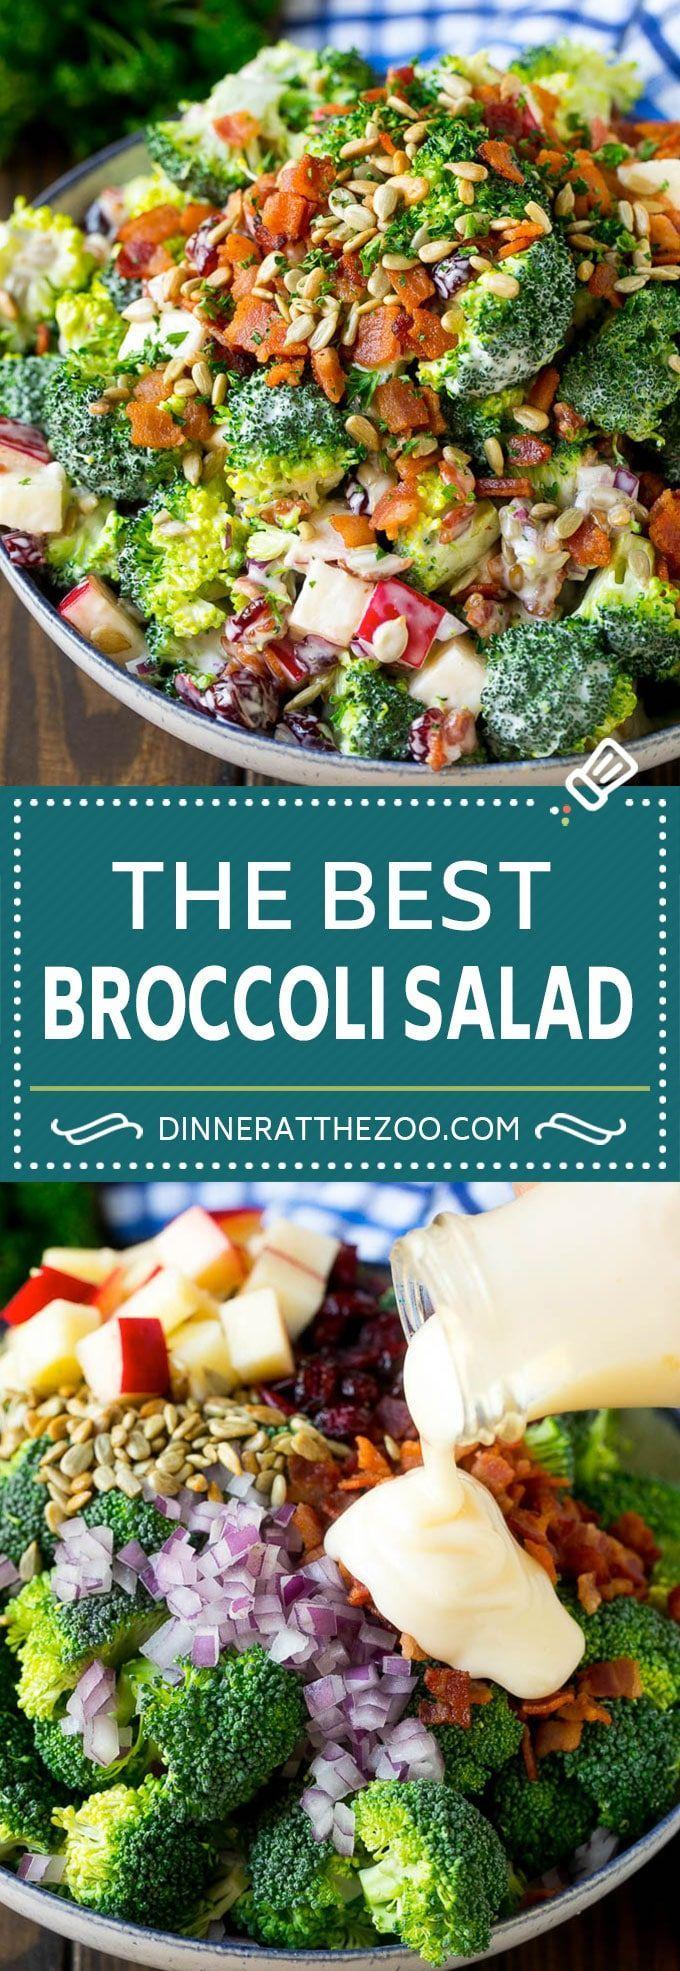 Broccoli Salad Recipe  Broccoli Salad Recipe   Creamy Broccoli Salad   Bacon Broccoli Salad